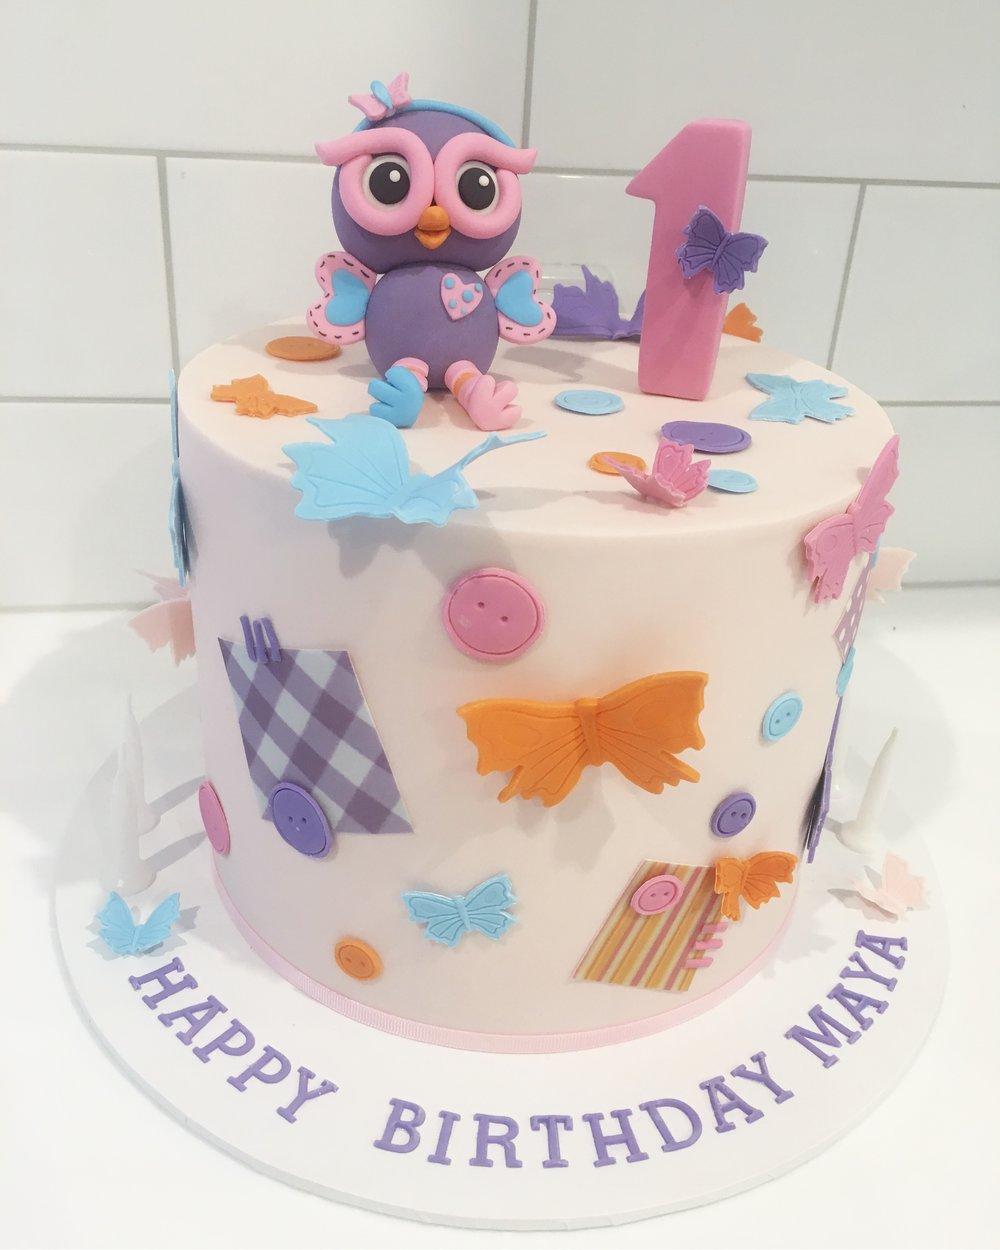 Hootabelle Birthday Cake